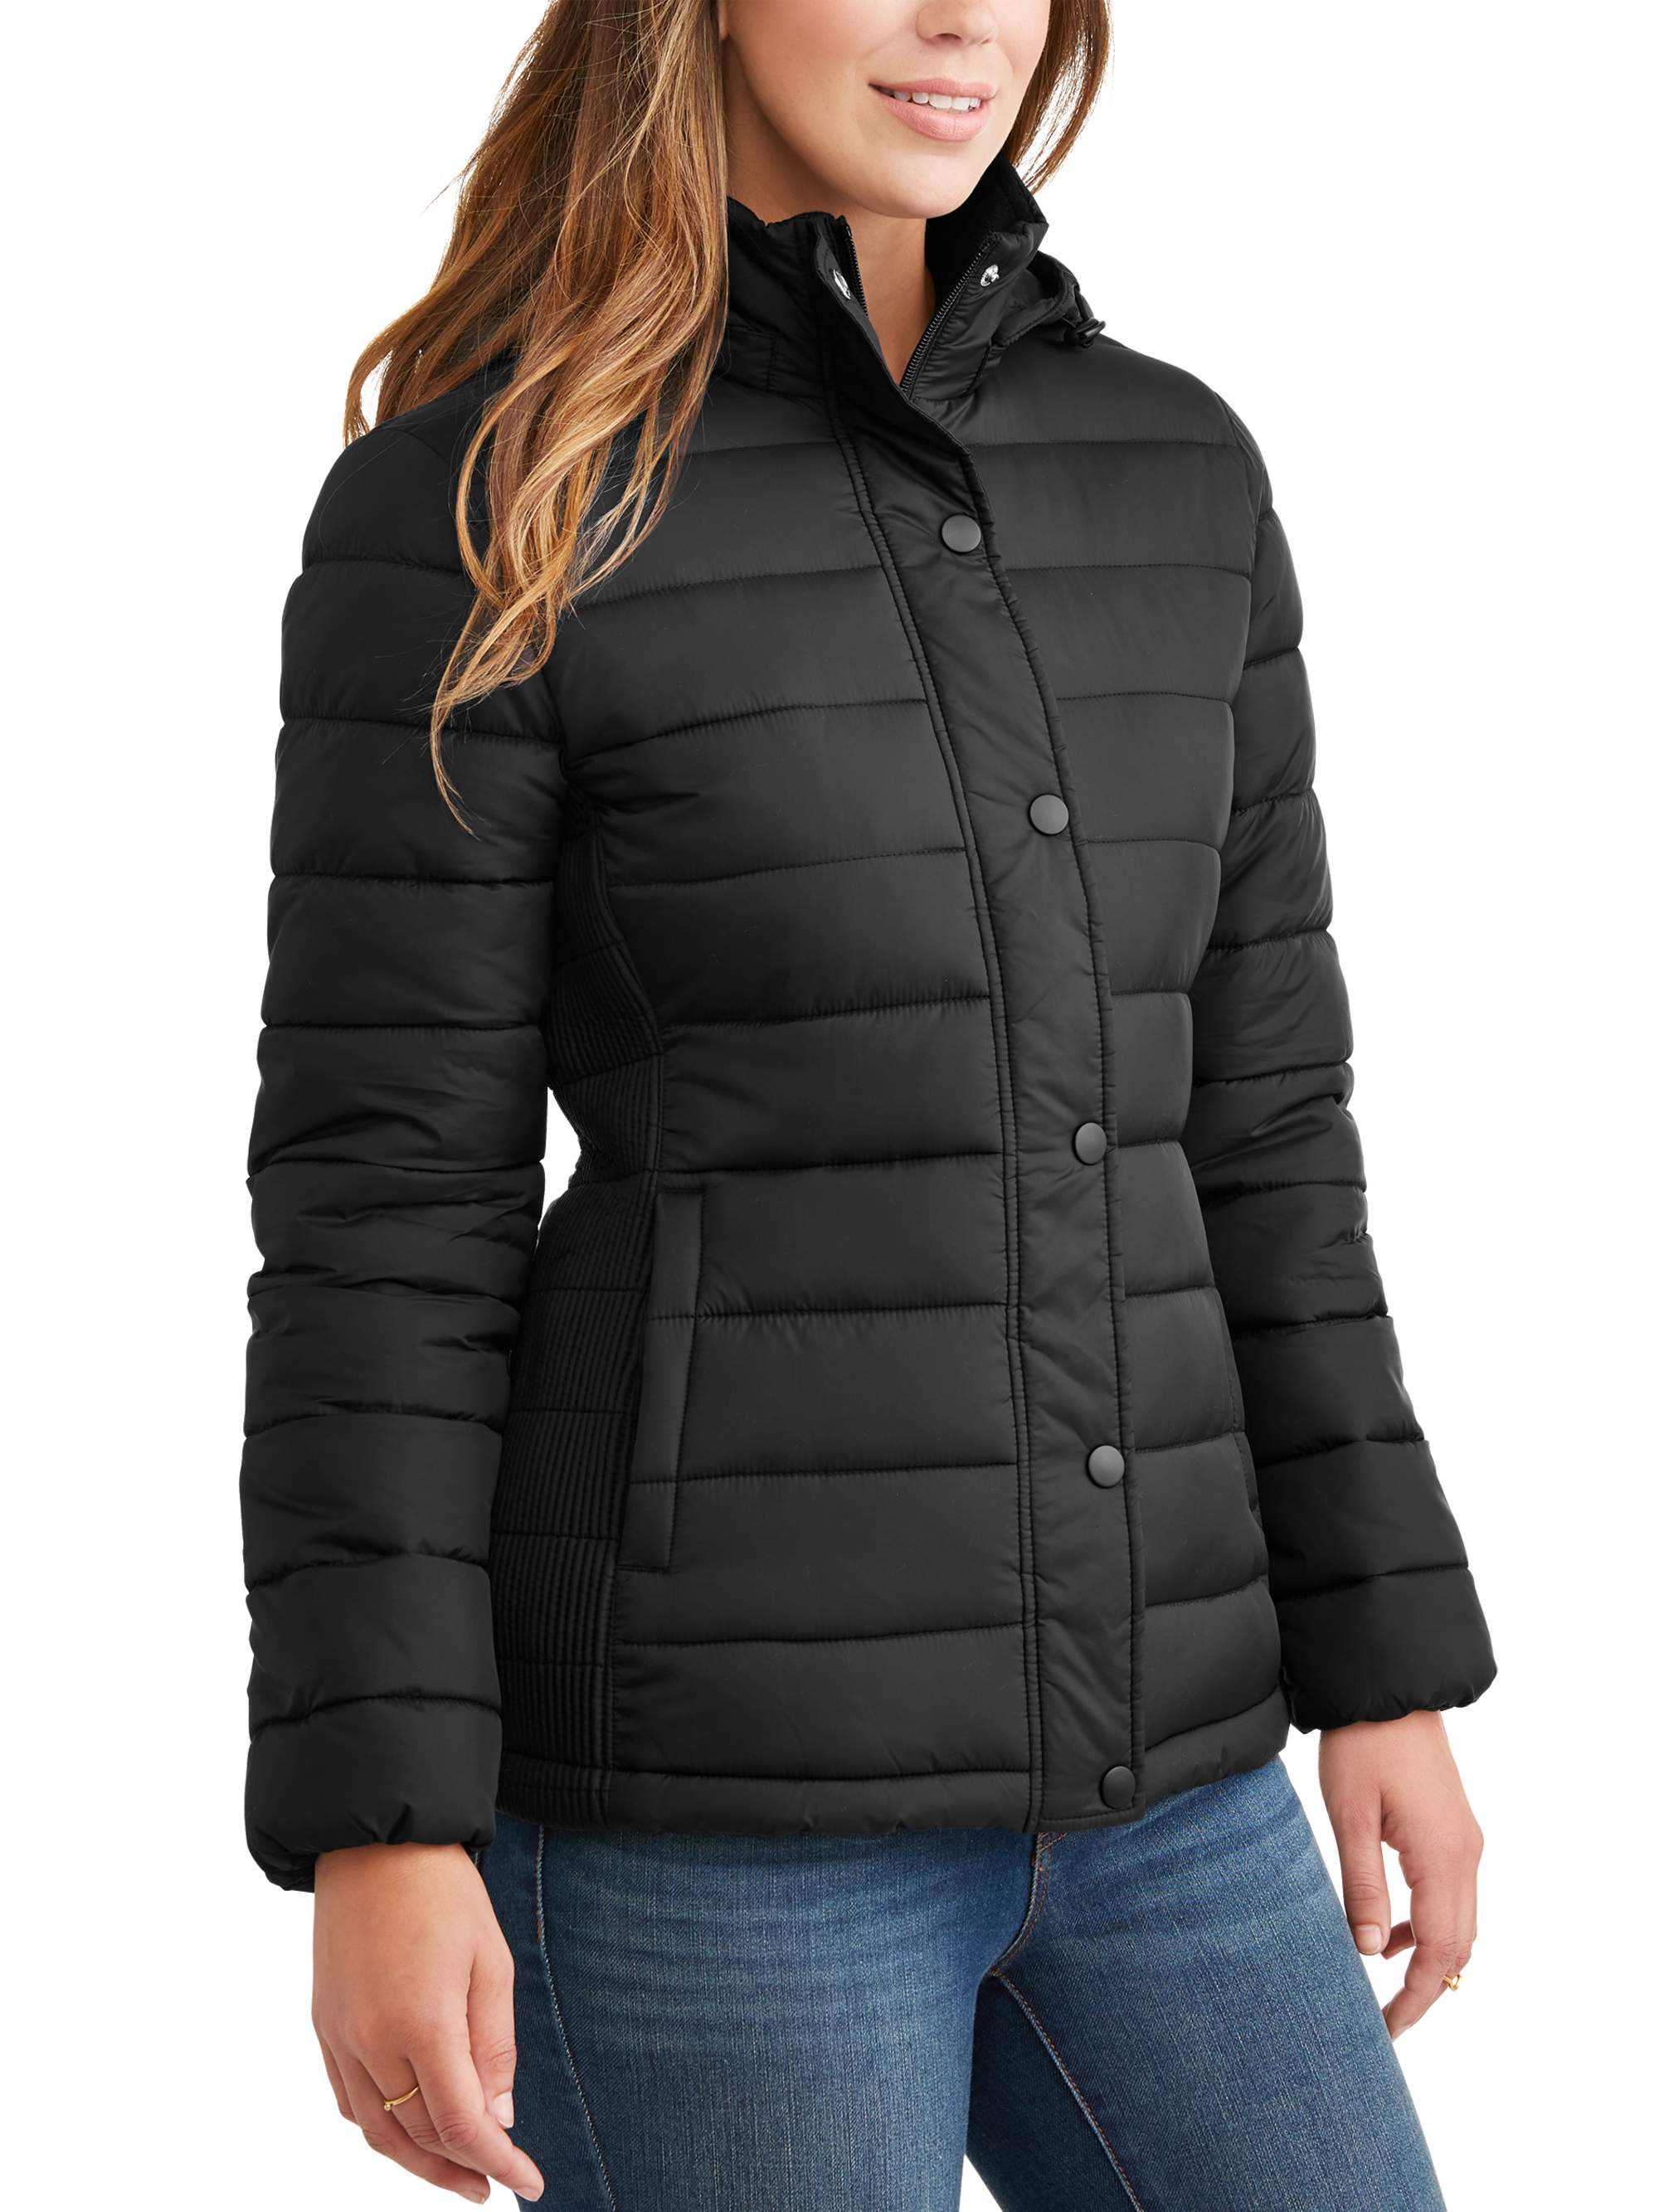 c7de1b554fa Time and Tru Women s Hooded Puffer Jacket – Walmart Inventory ...